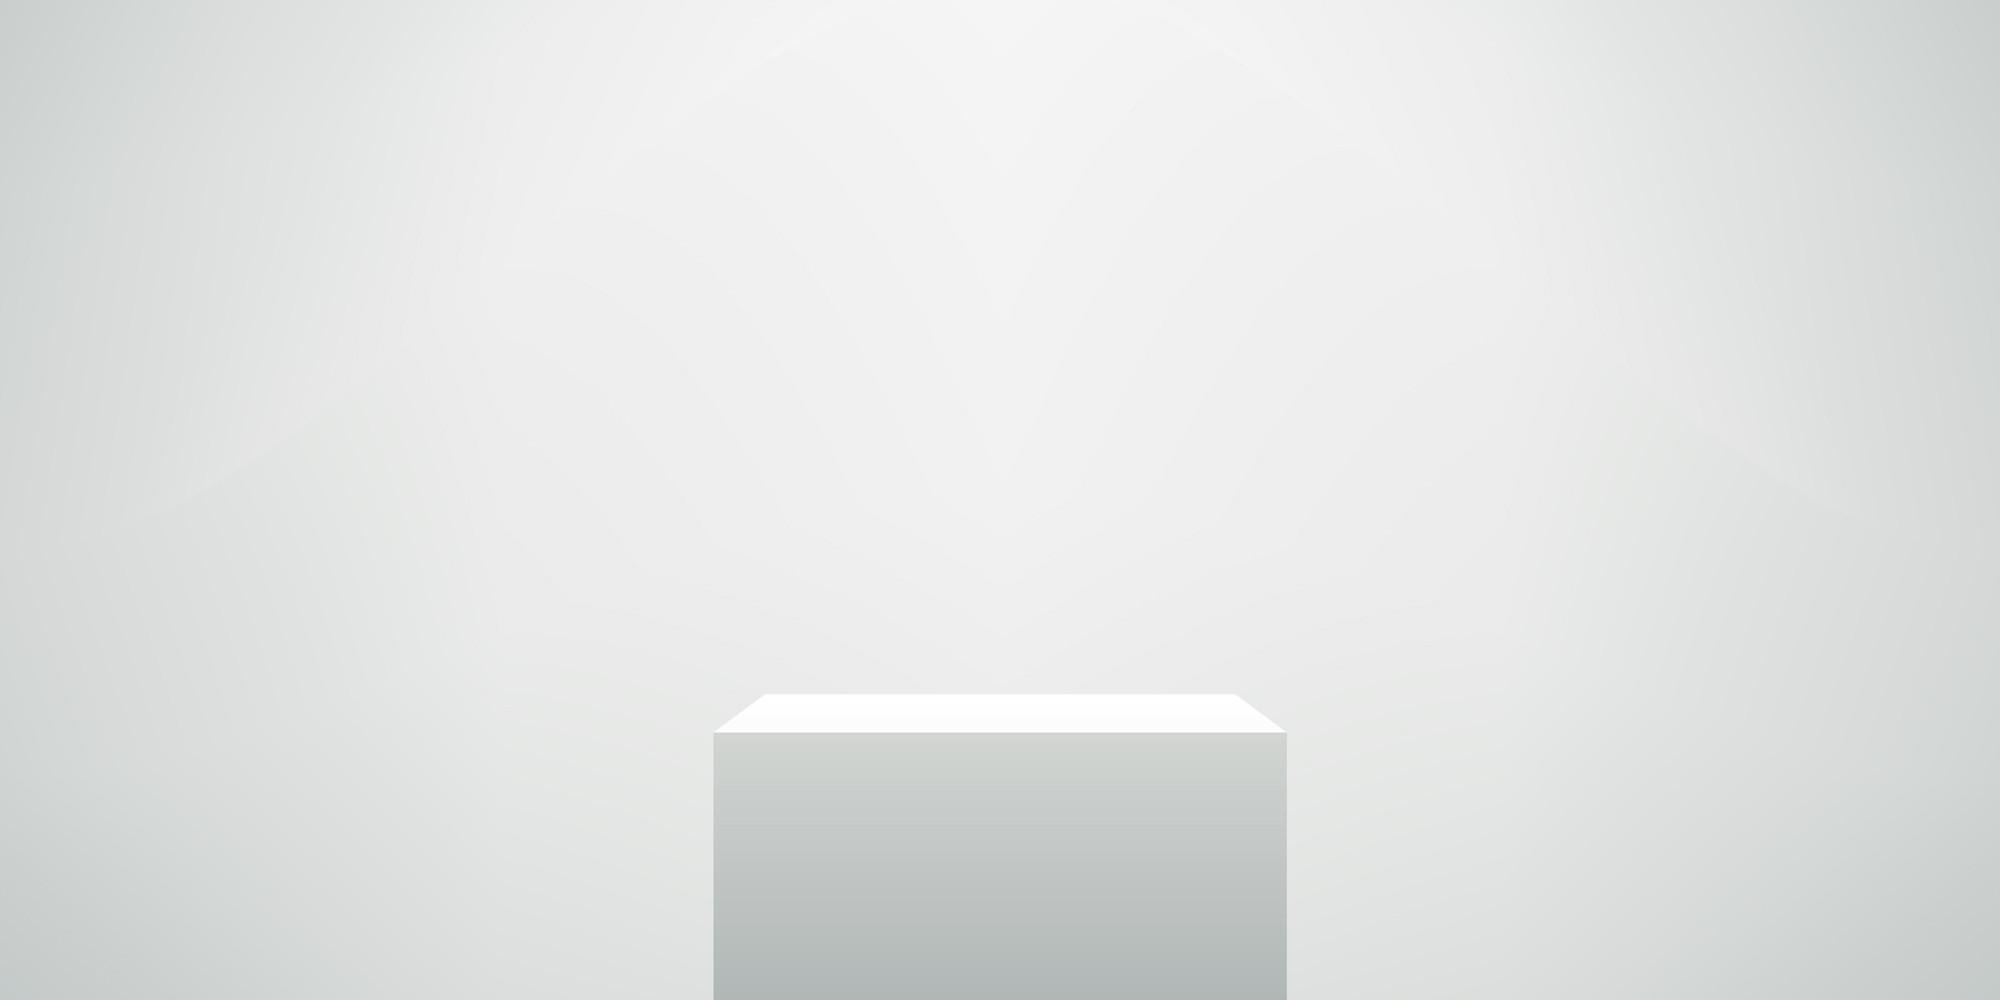 「WHITE MAGAZINE」展 会期延長のお知らせ